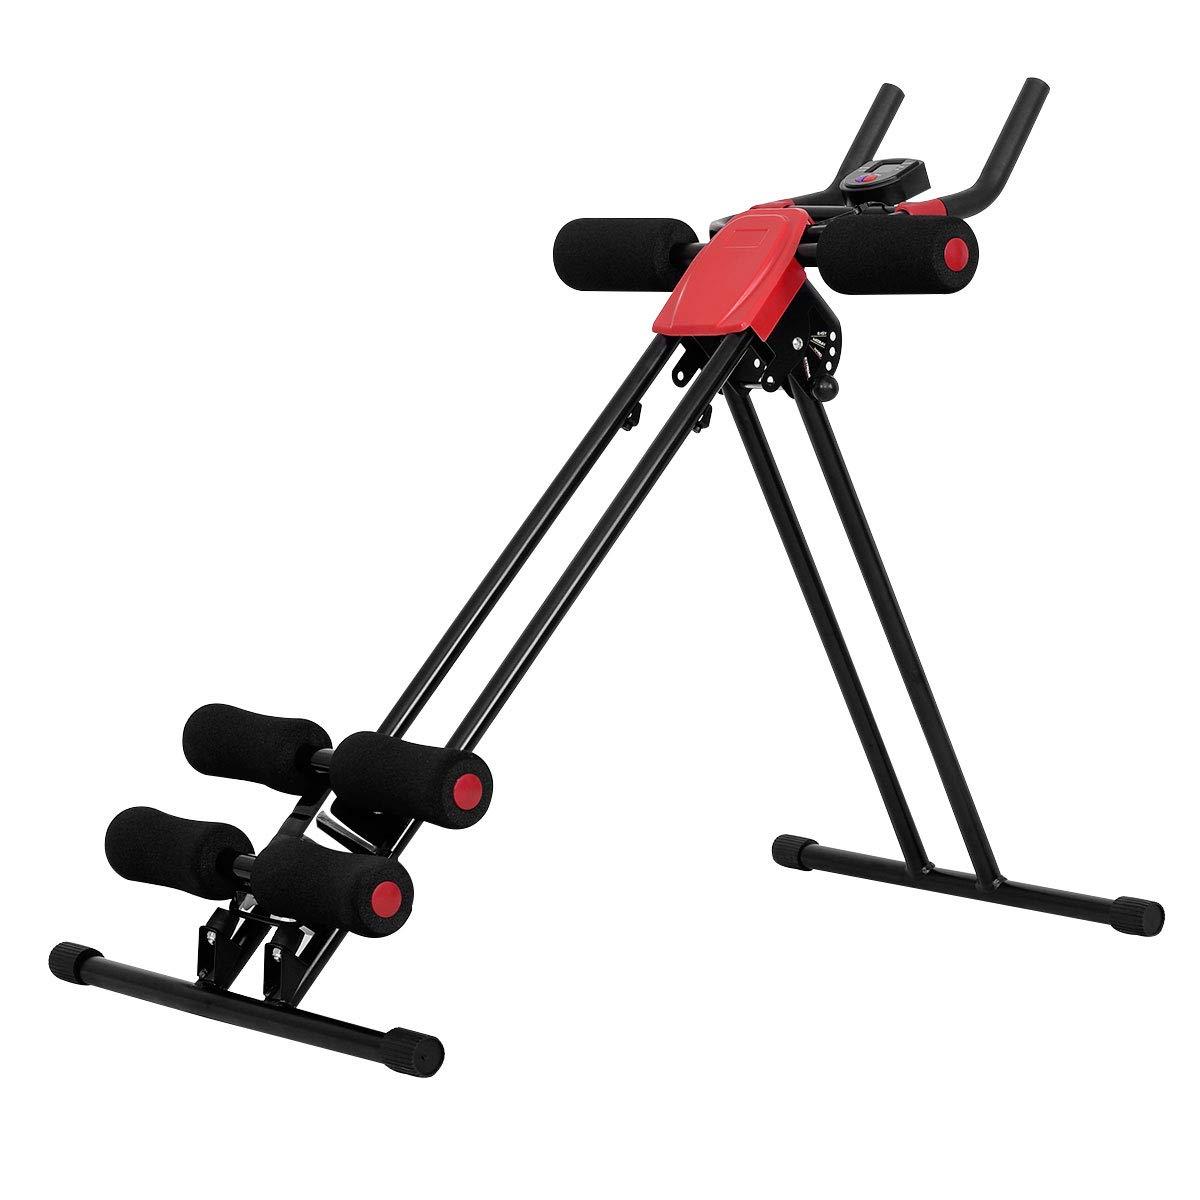 Goplus Ab Trainer Abdominal Trainer Ab Vertical 5 Minute Shaper Waist Trainer Core Toner Ab Cruncher Fitness Machine Equipment W/LED Counter